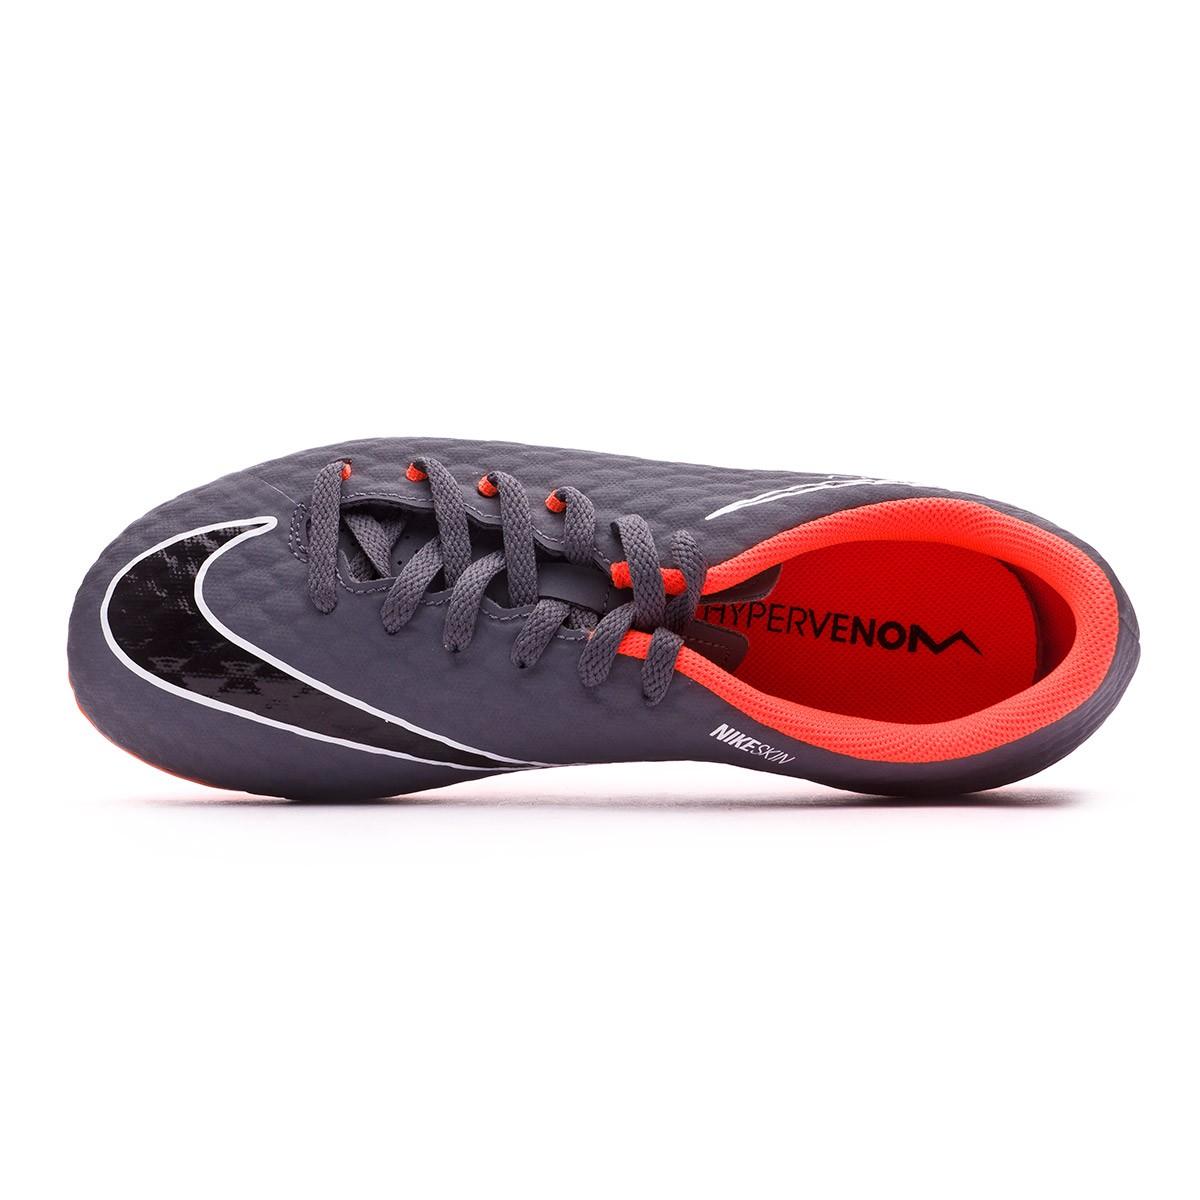 Bota de fútbol Nike Hypervenom Phantom III Academy FG Niño Dark grey